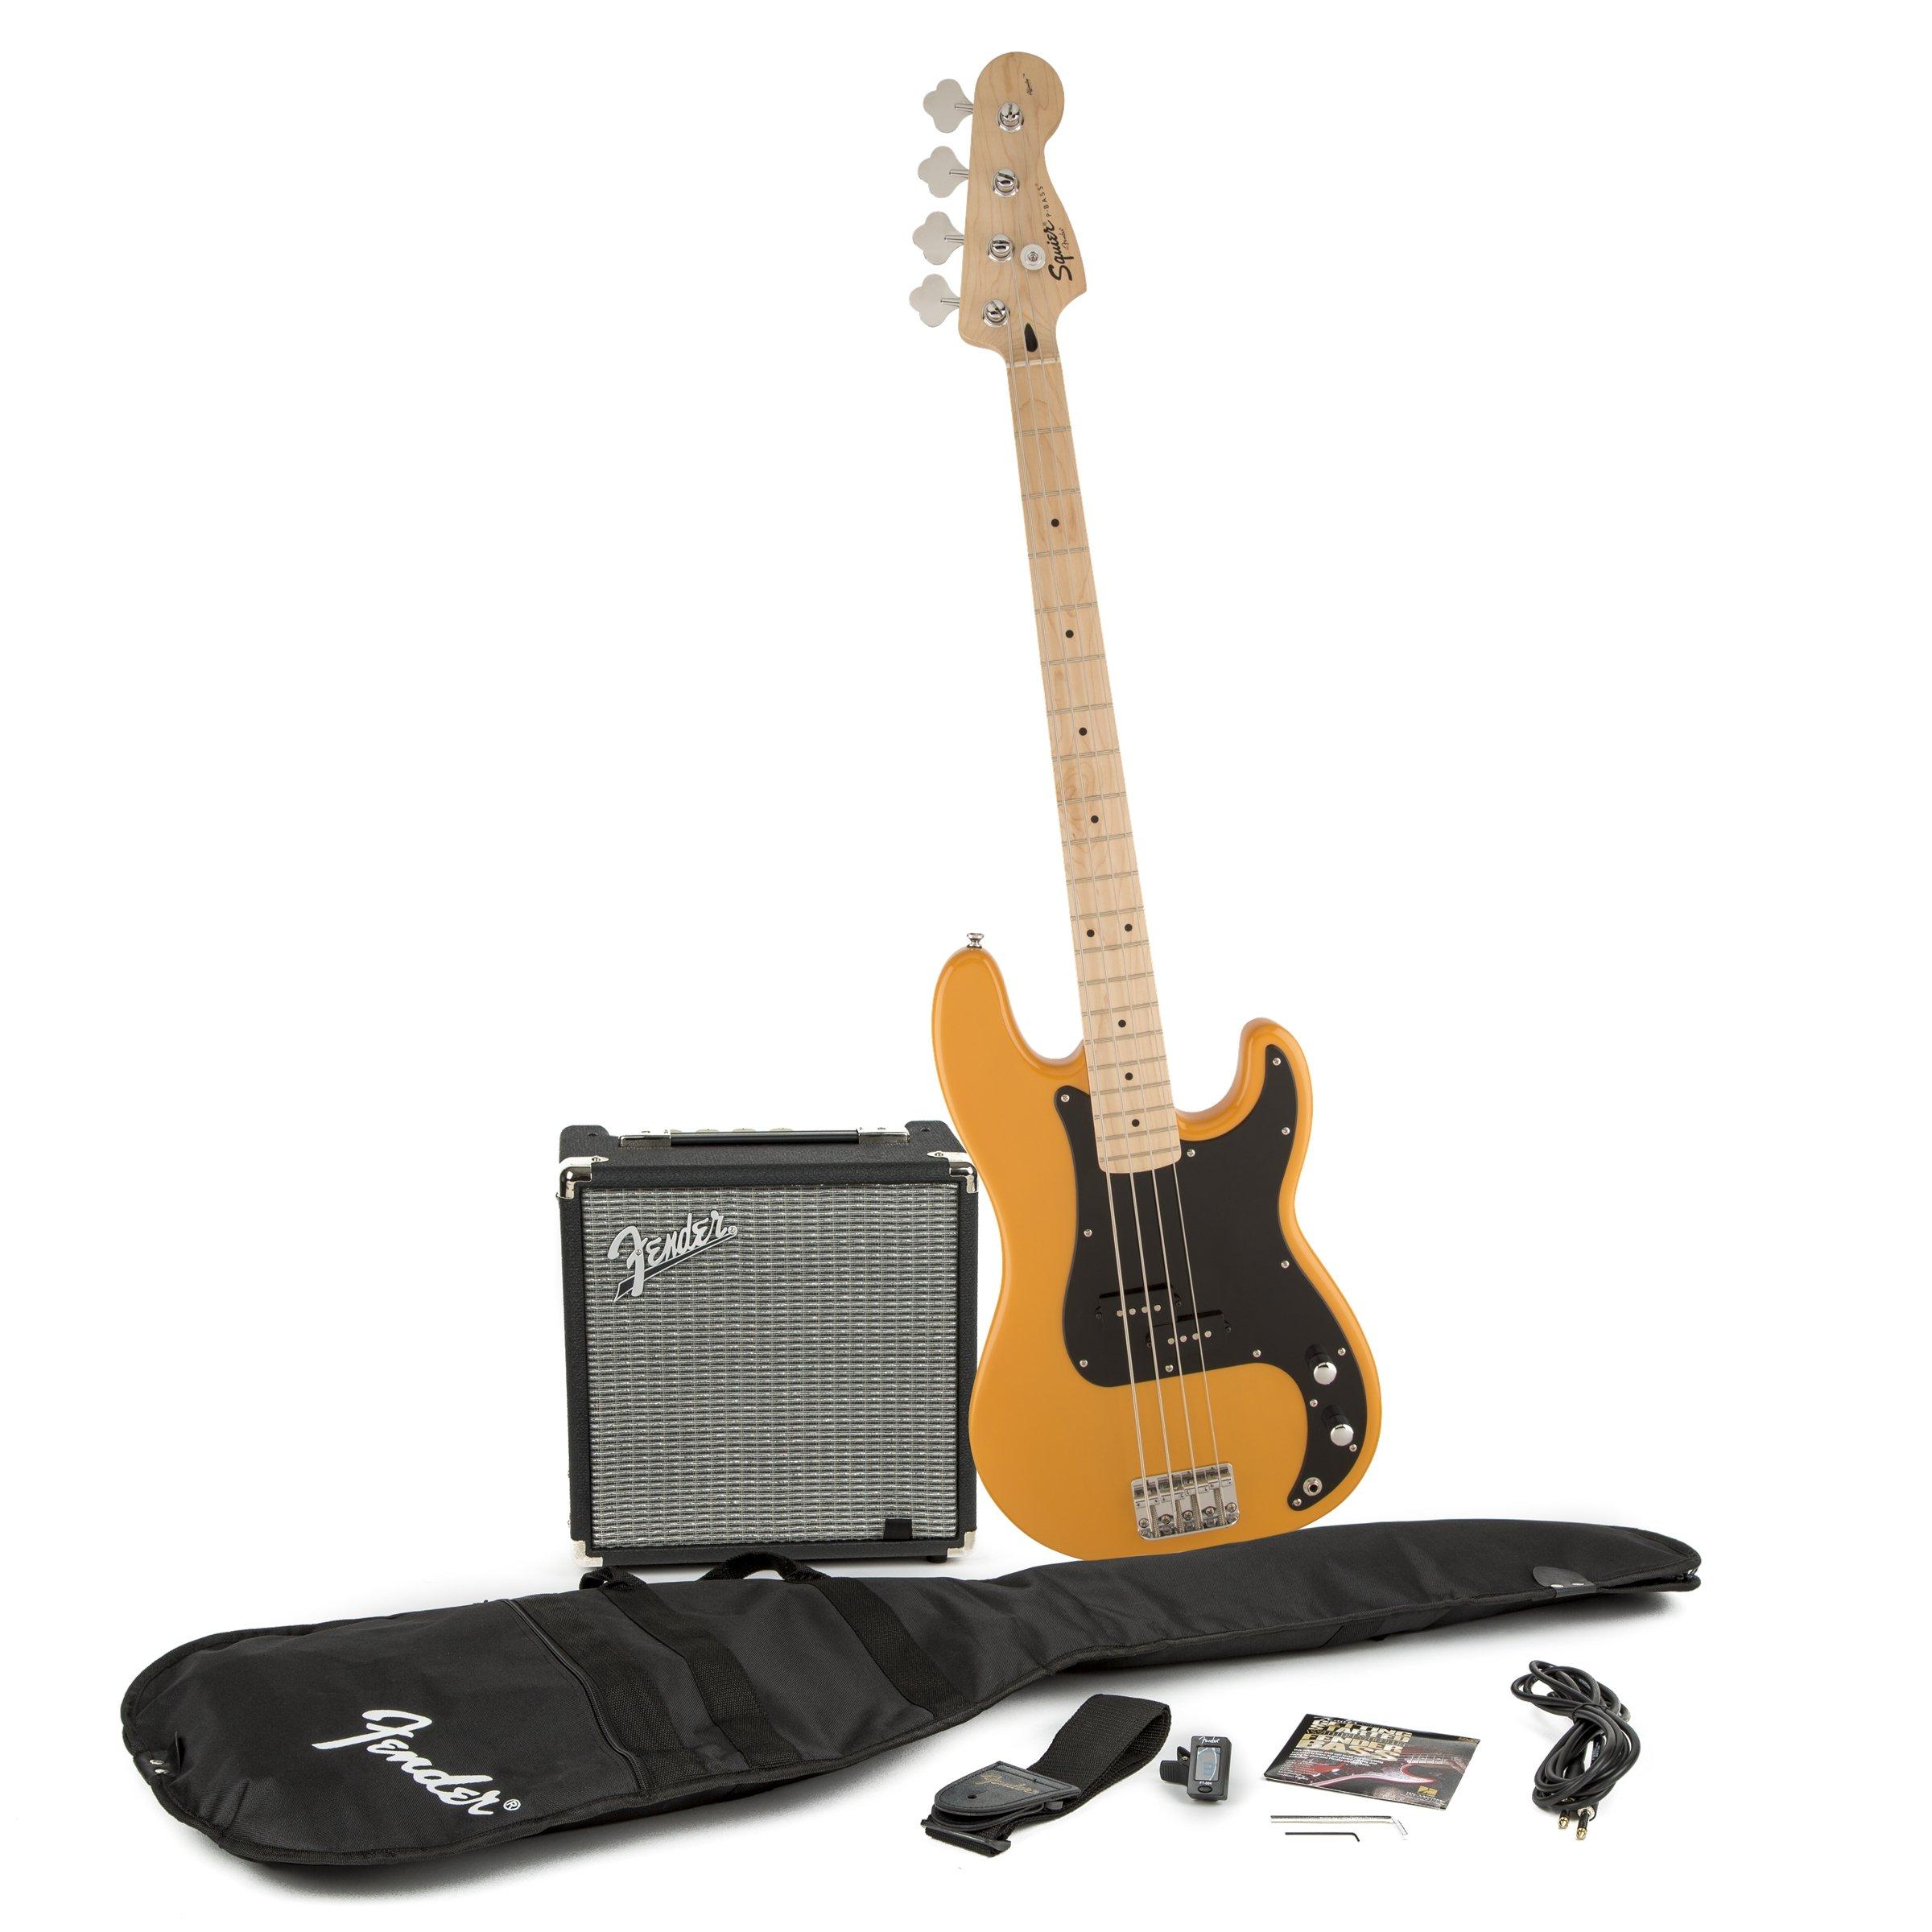 Squier by Fender P Bass Beginner Guitar Pack, Butterscotch Blonde by Fender